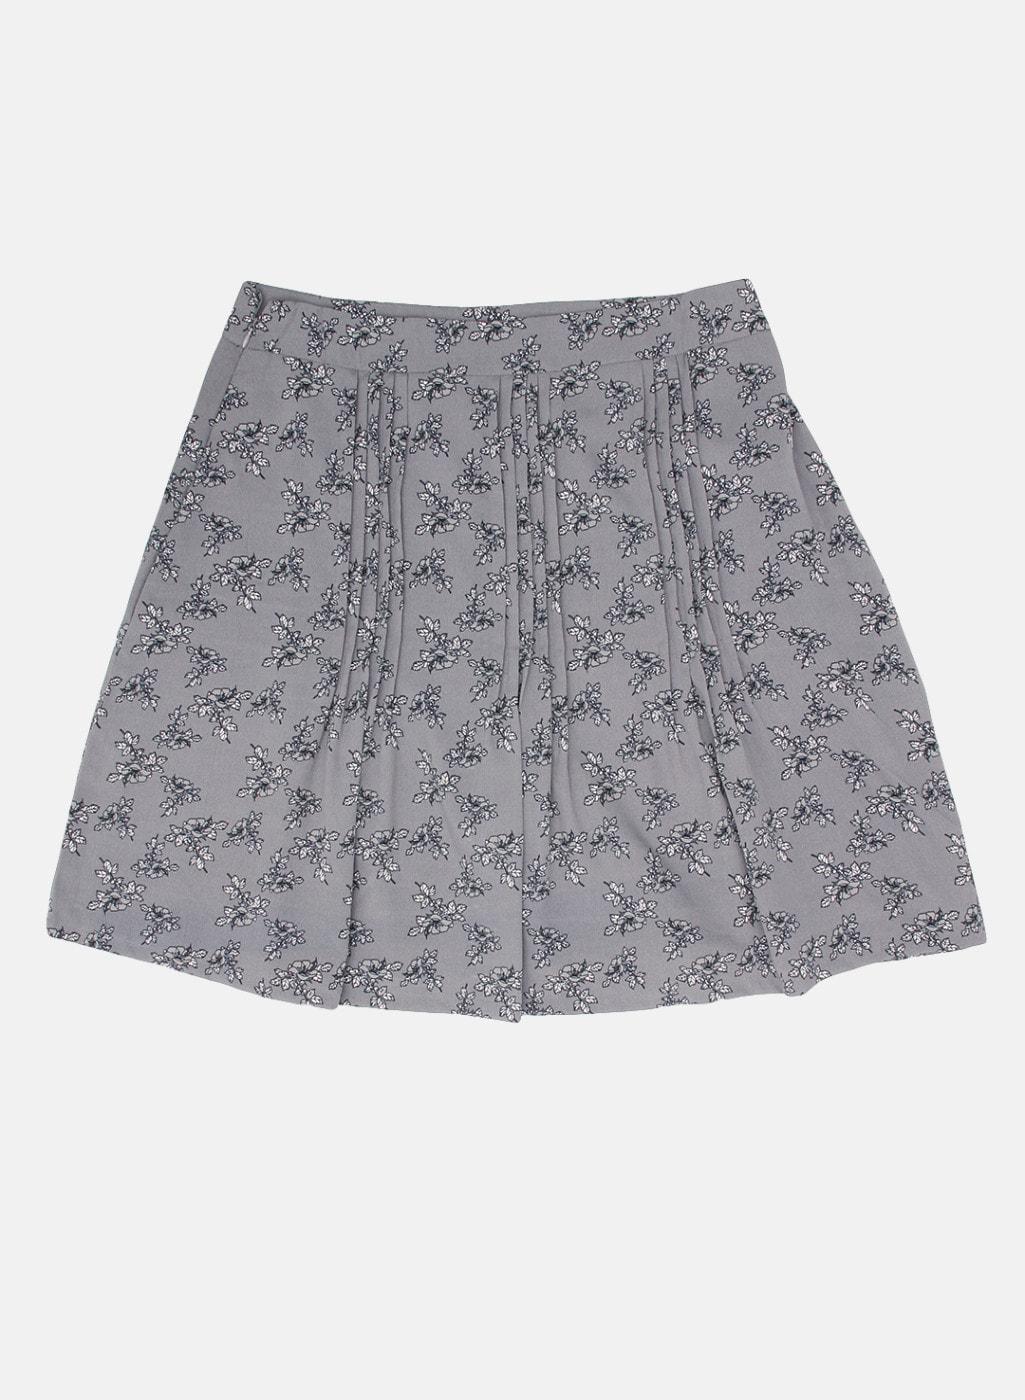 aeca64d1505 Dressberry Skirts - Buy Dressberry Skirts online in India - Jabong